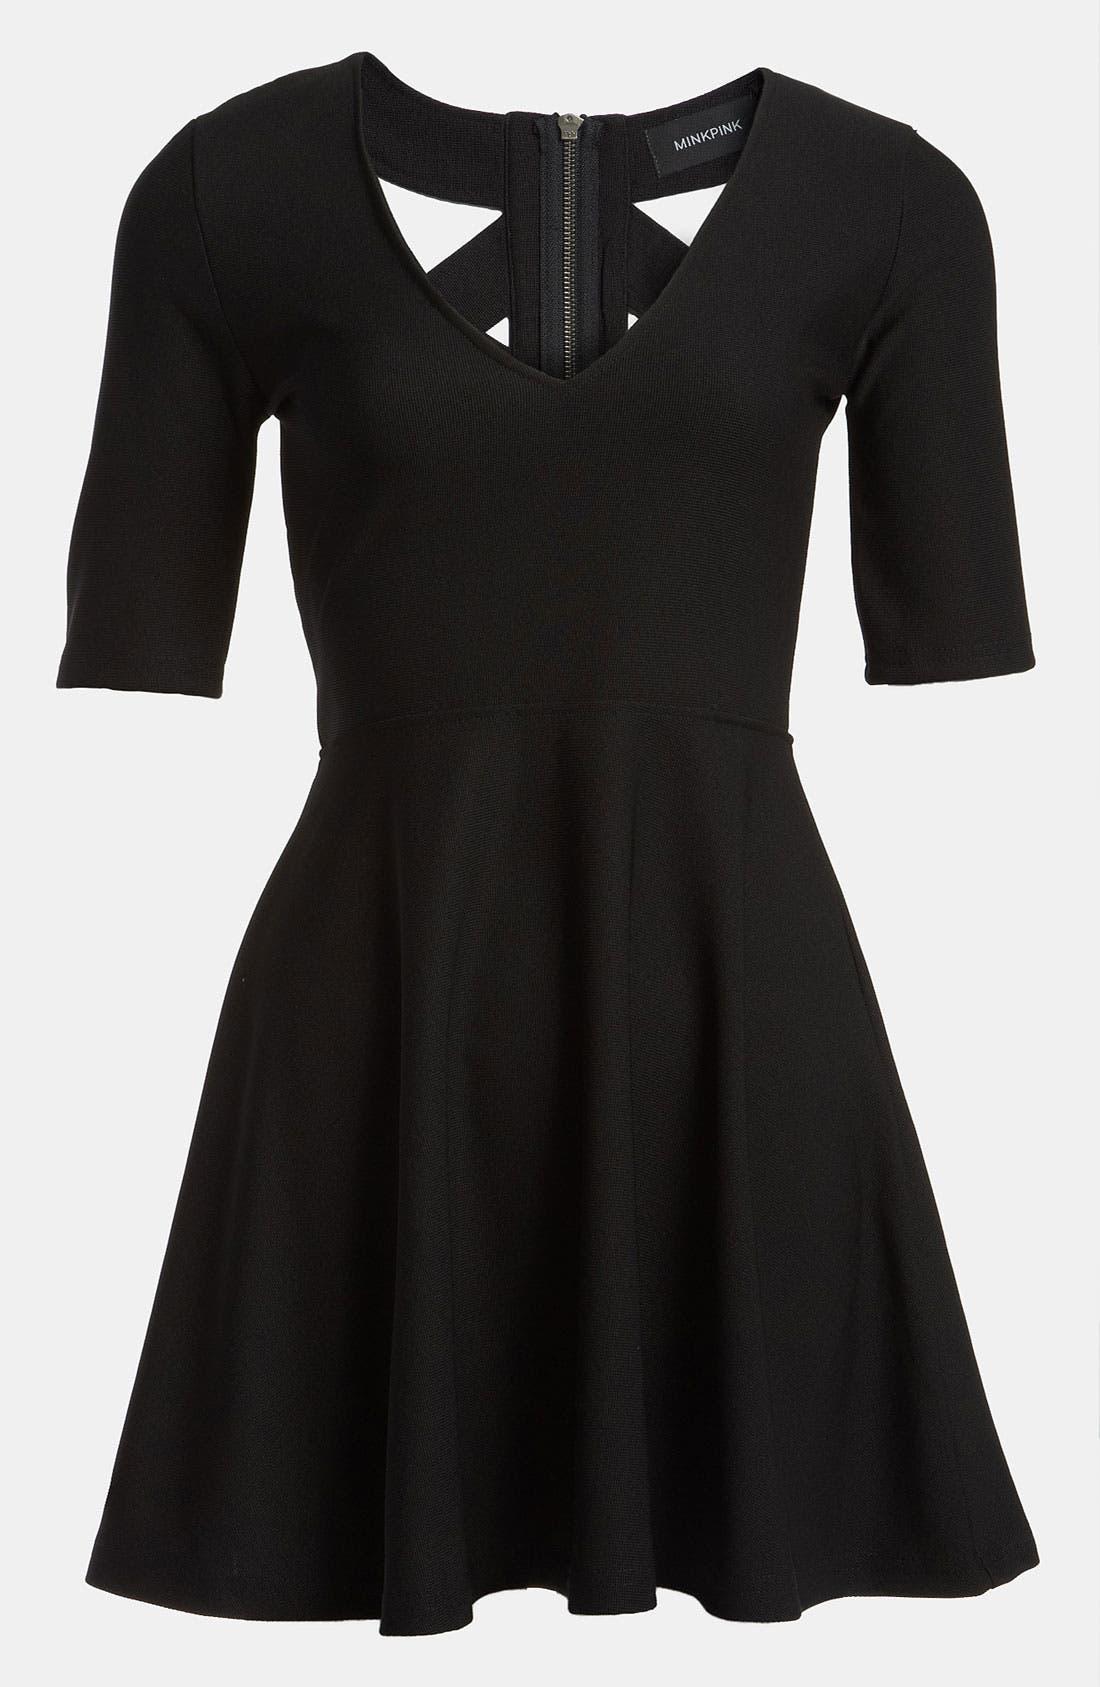 Alternate Image 1 Selected - MINKPINK 'All Coming Back' Dress